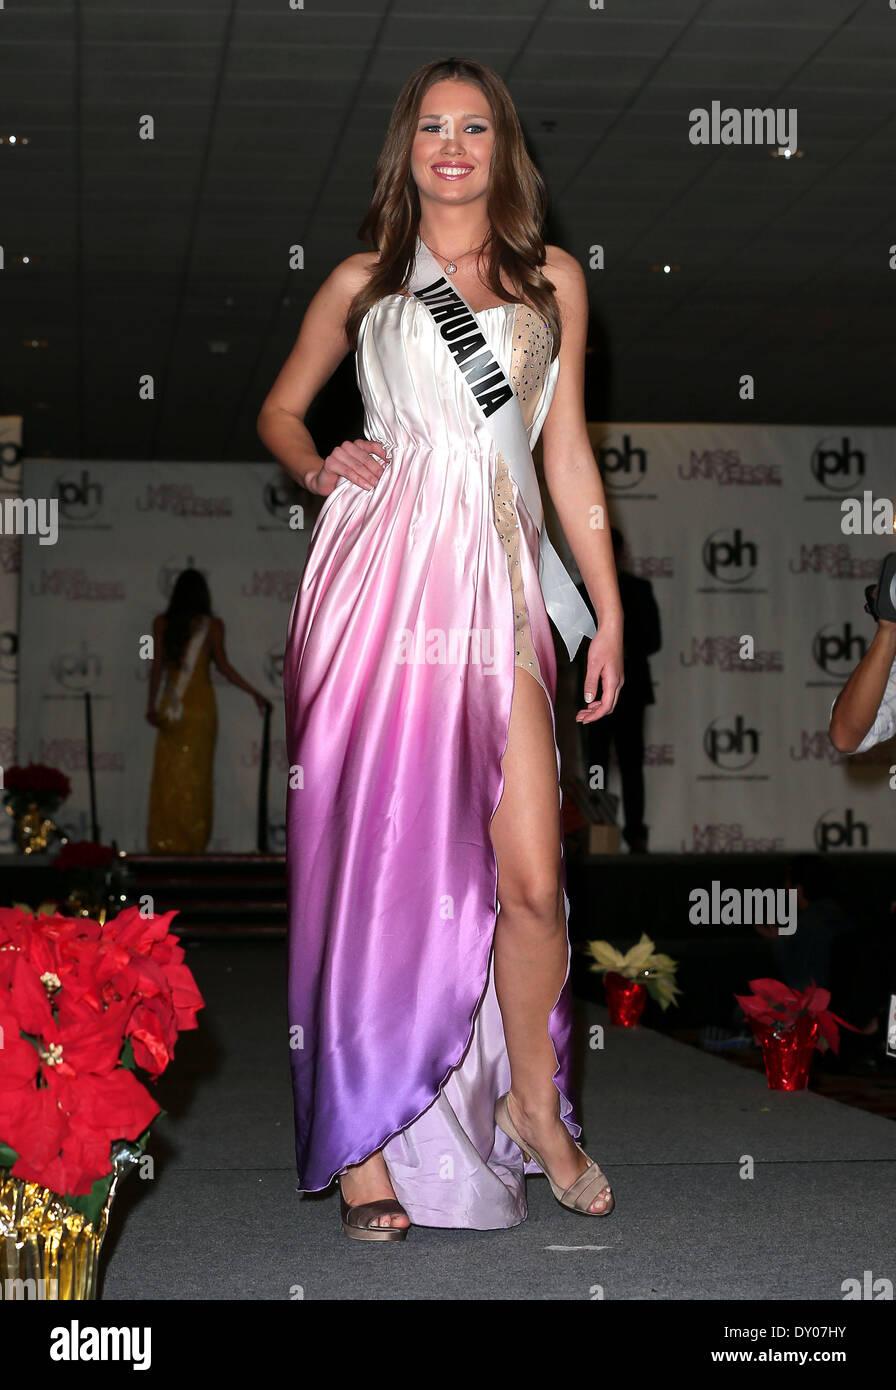 Miss Universo llegadas en el Planet Hollywood Resort and Casino en Las Vegas con: Greta Mikalauskyte Miss Lituania Foto de stock